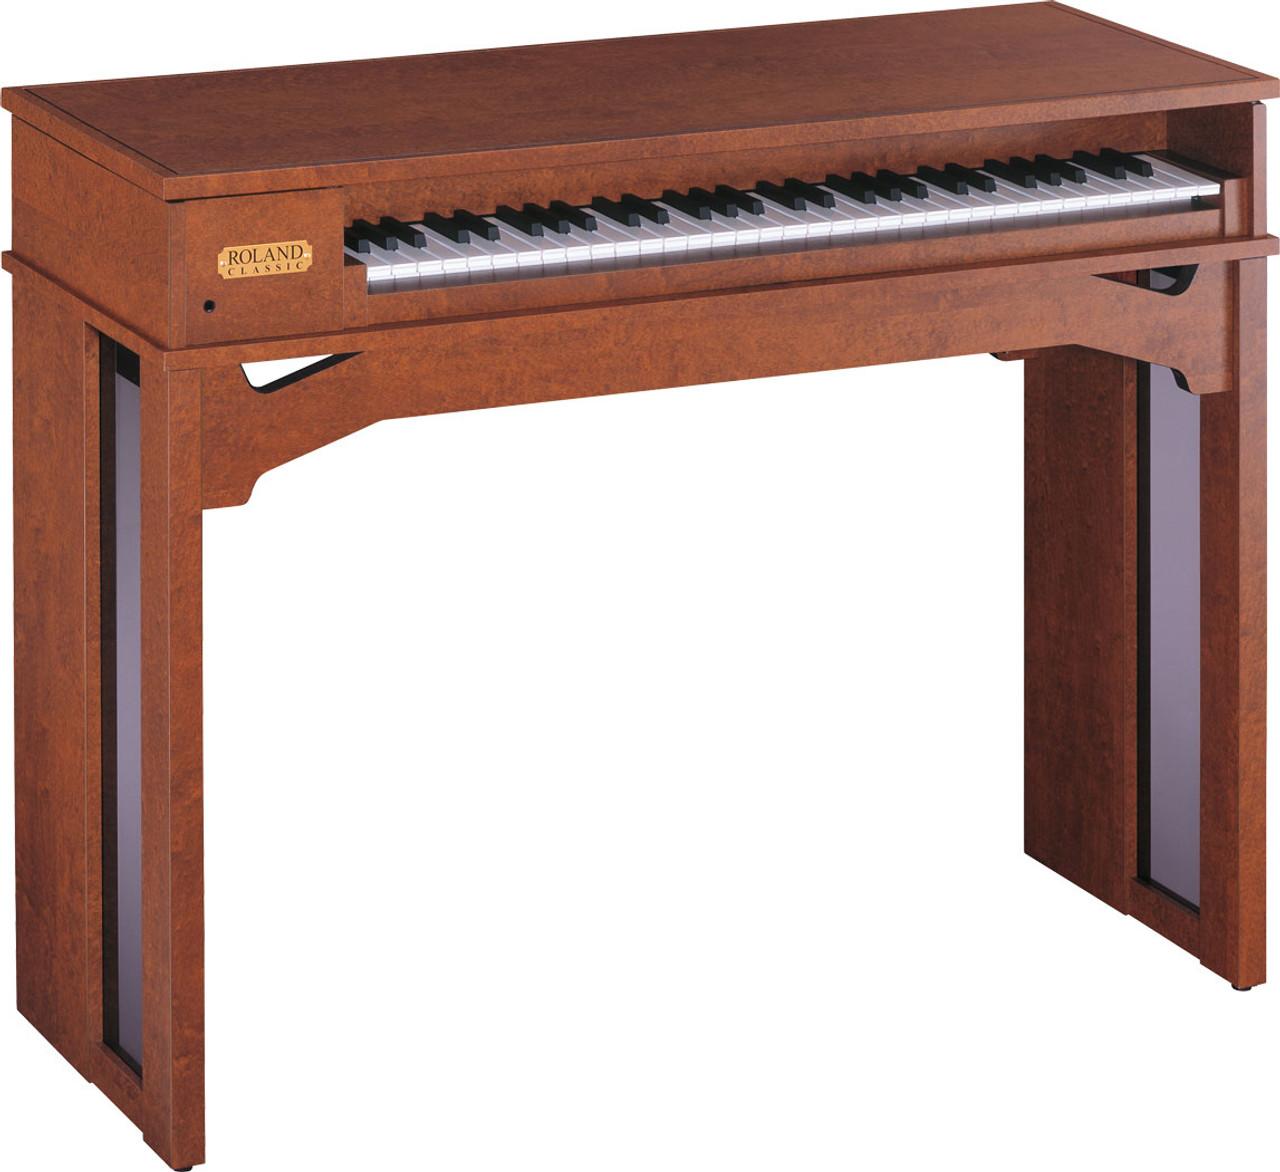 Roland C30 Digital Harpsichord